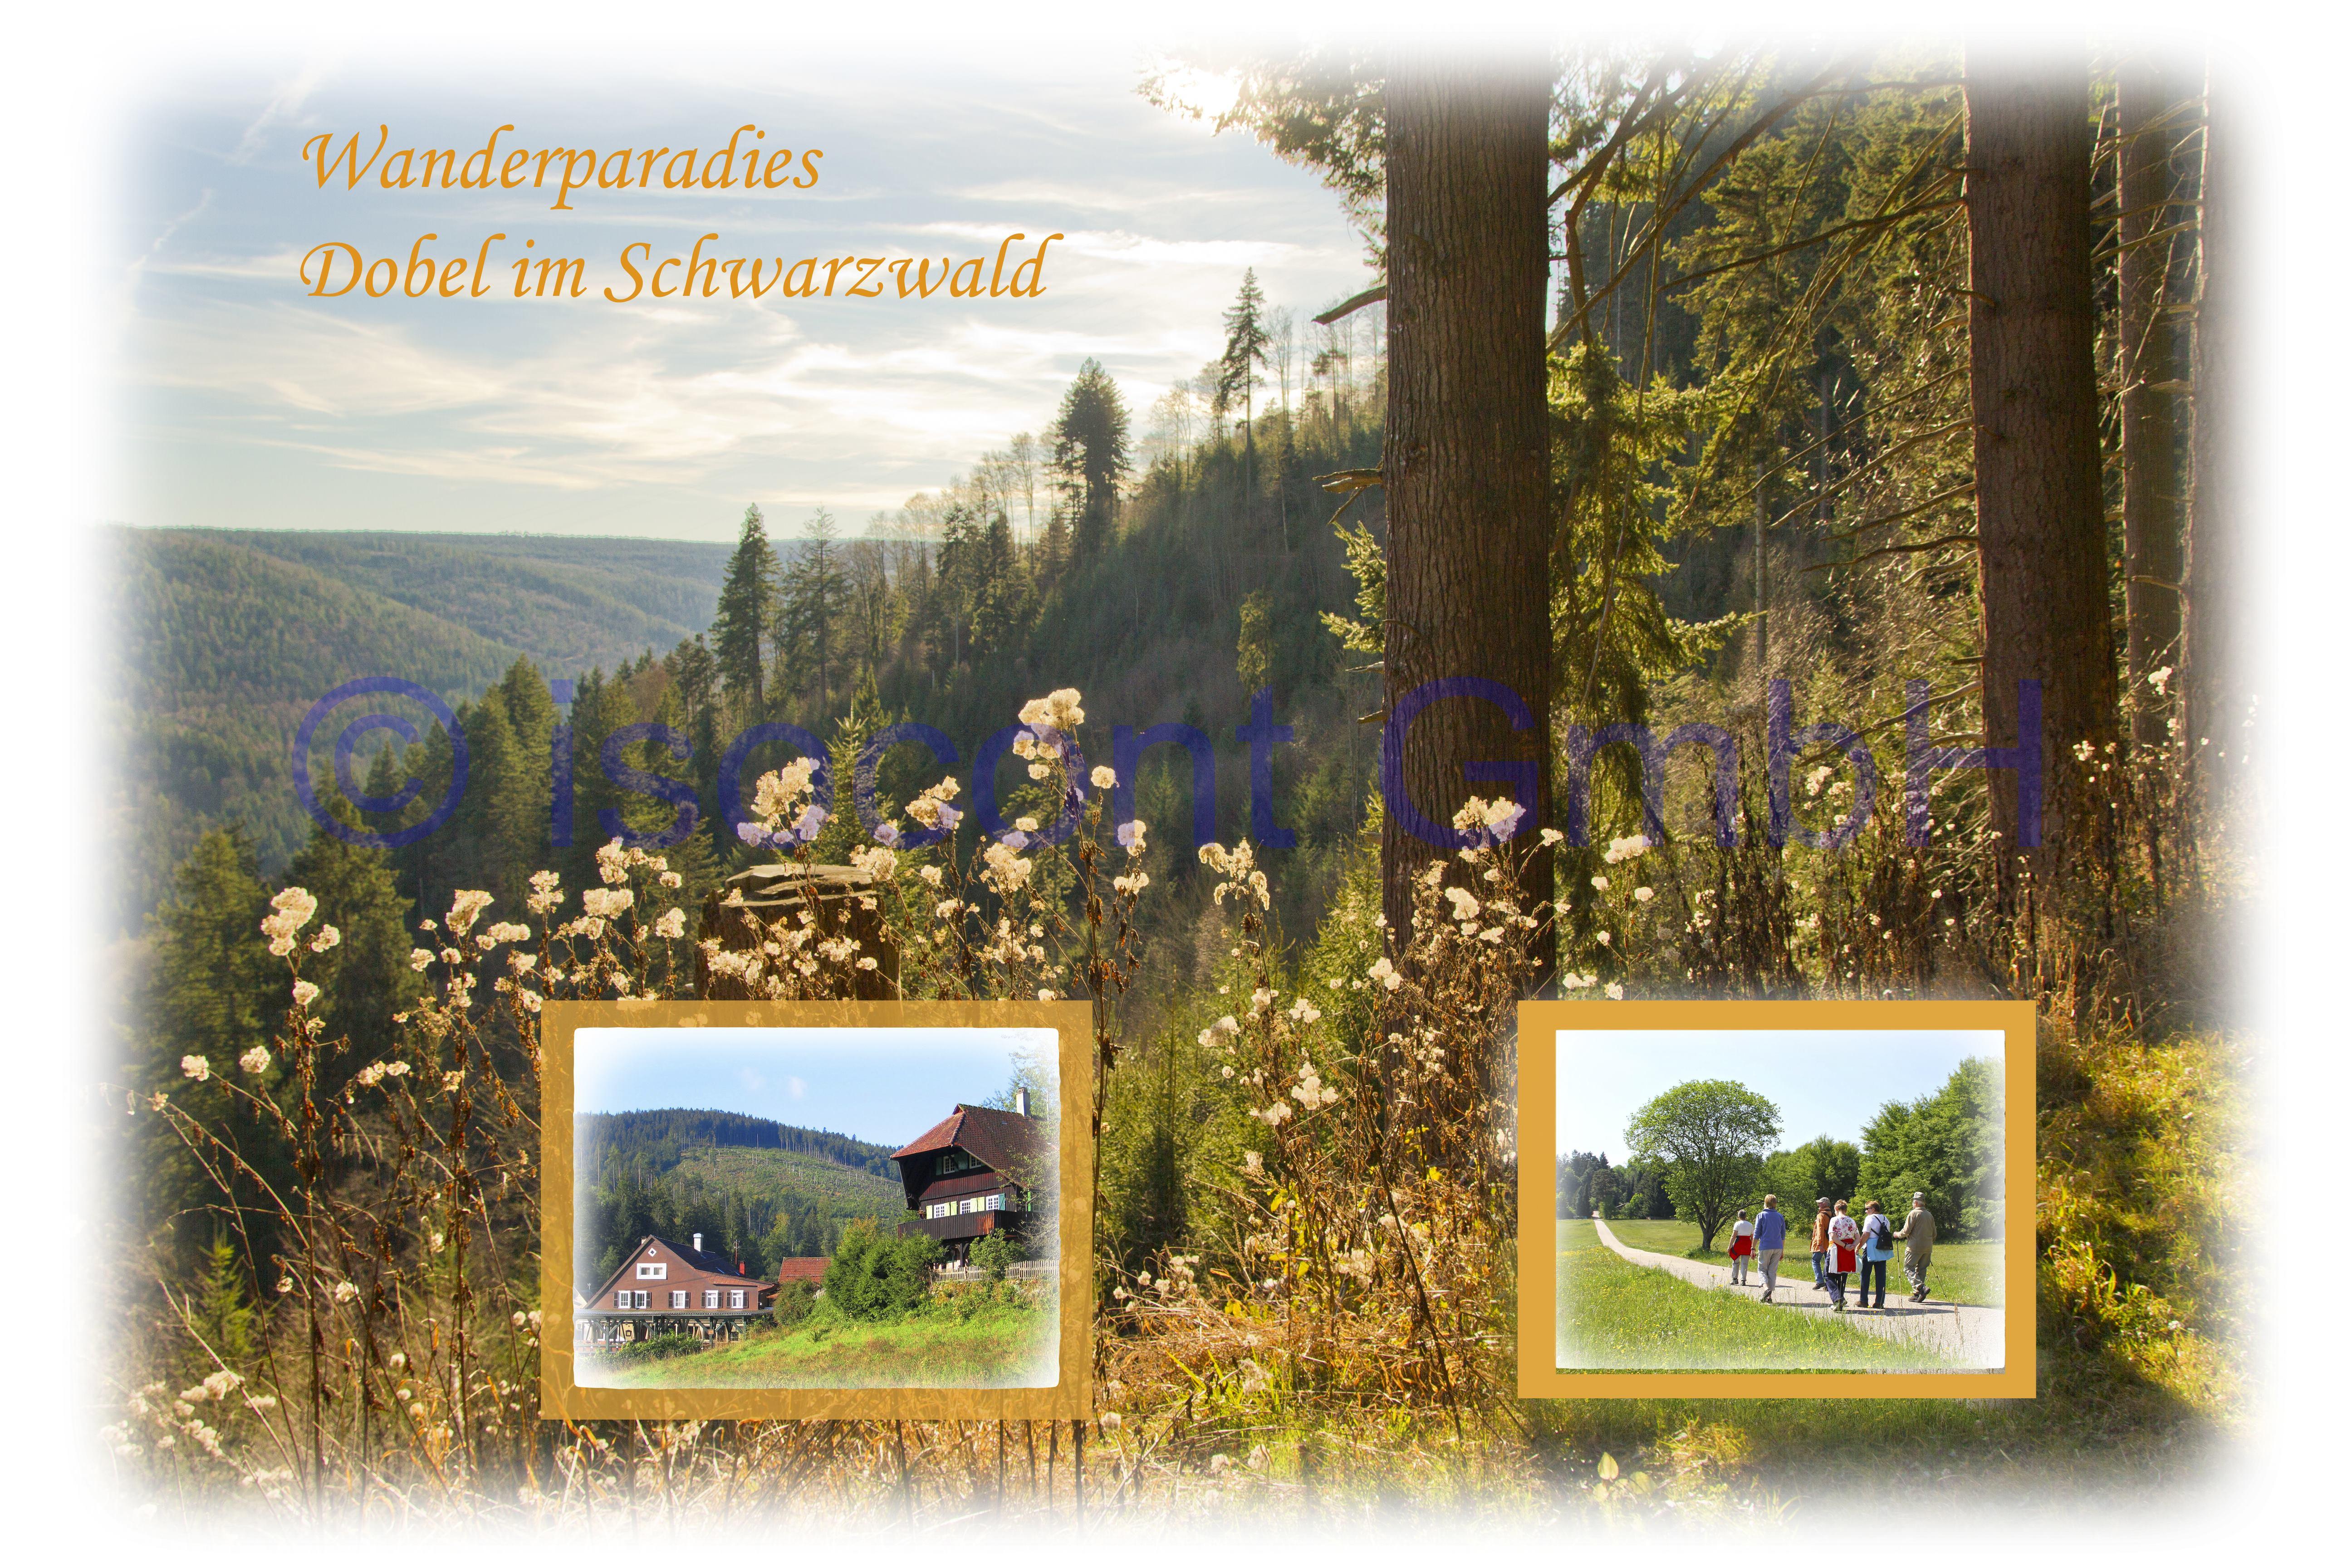 Postkarte Wanderparadies Dobel 2-1